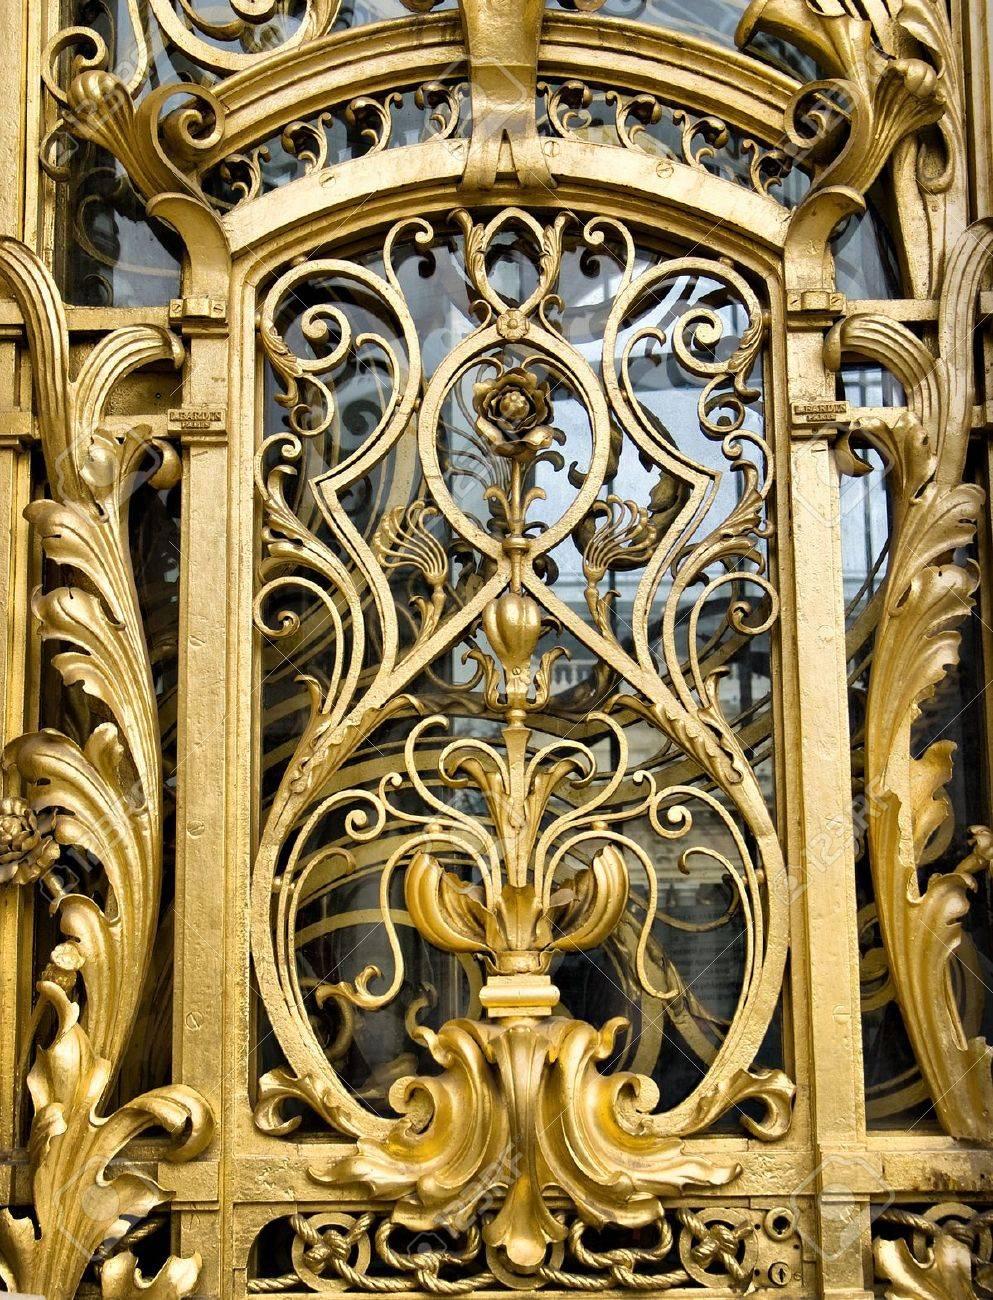 Detail of a golden door at the Petit Palais in Paris Stock Photo - 16268564 & Detail Of A Golden Door At The Petit Palais In Paris Stock Photo ... Pezcame.Com